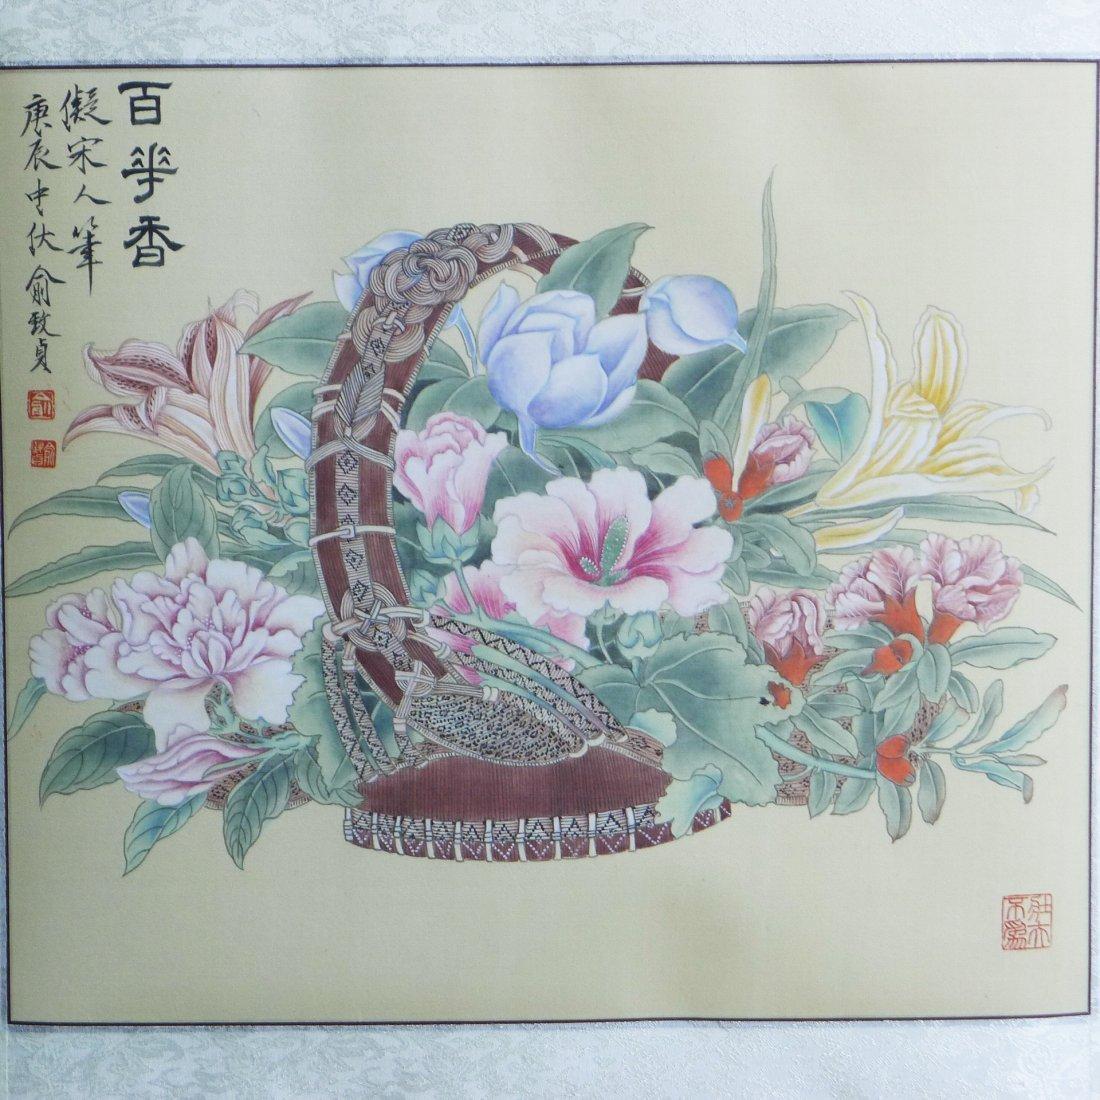 CHINESE SILK METICULOUS PAINTING BY YU ZHIZHEN